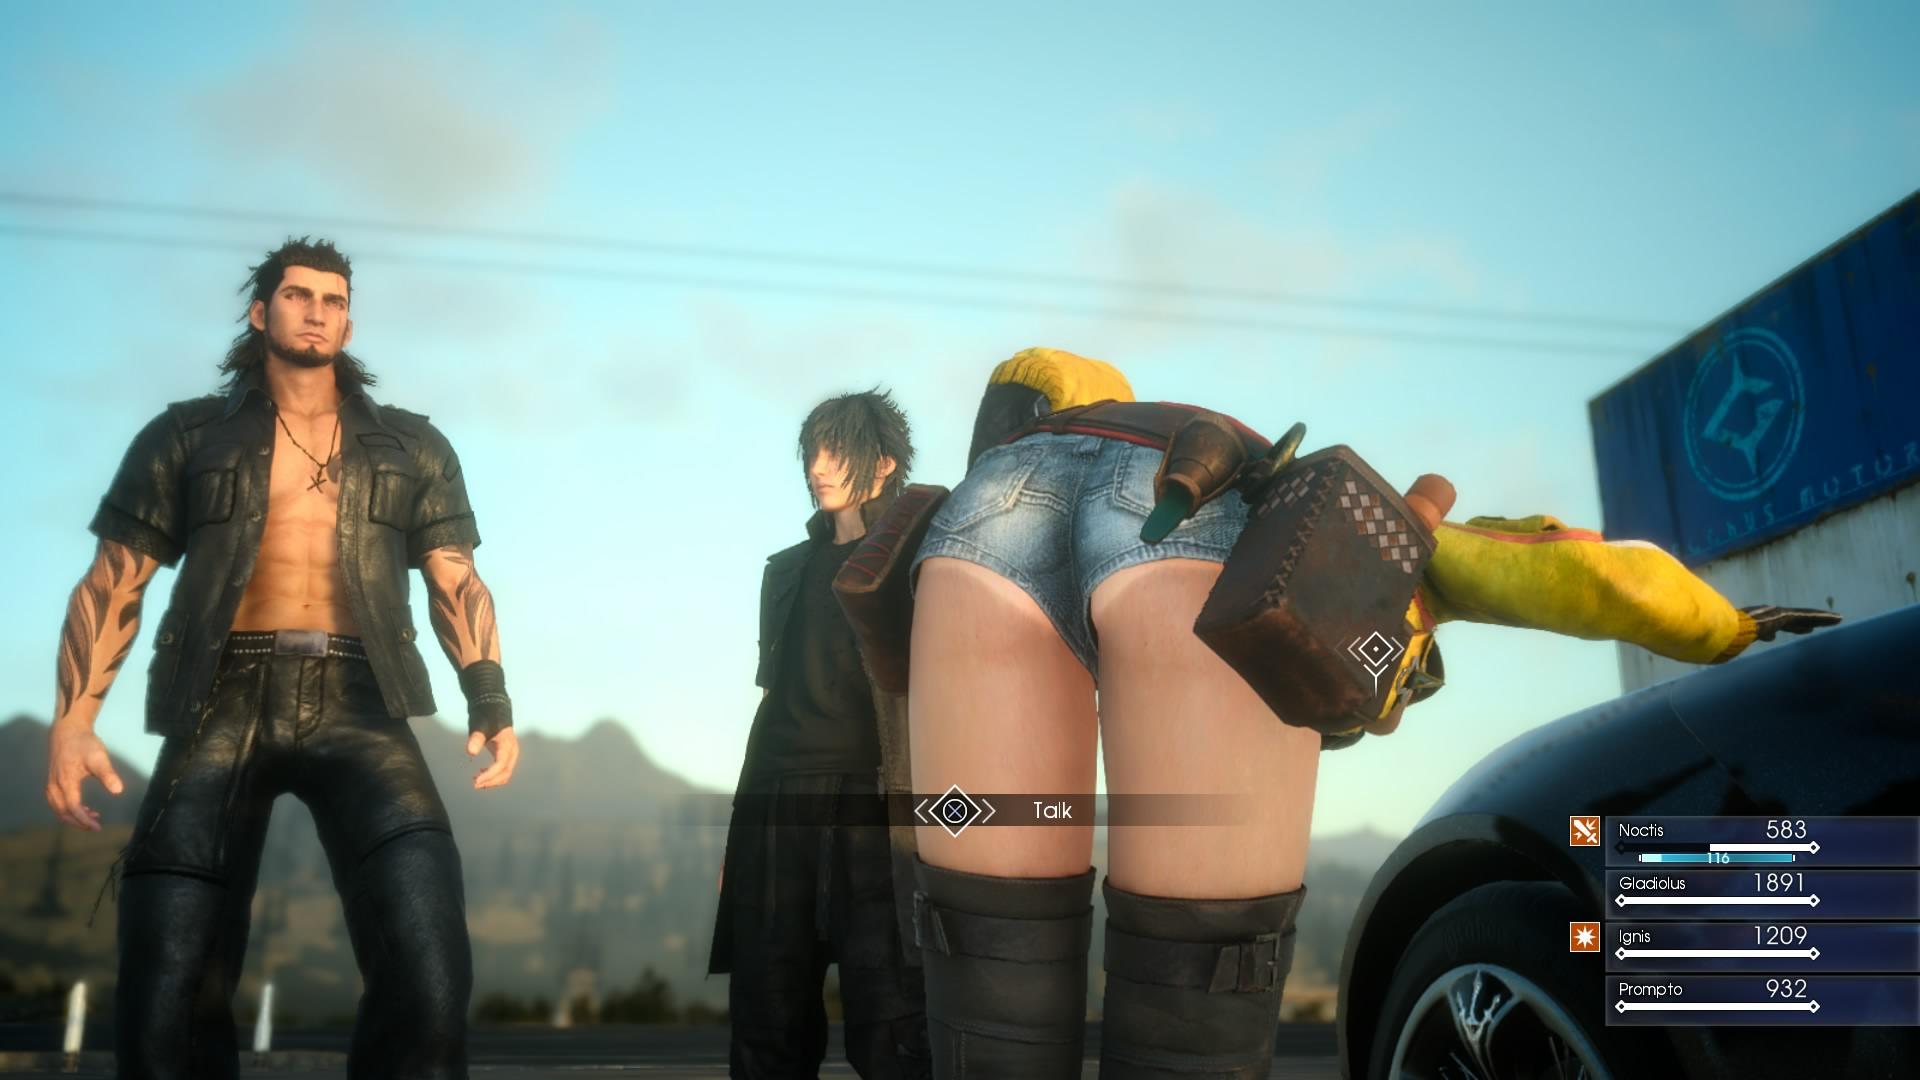 Final Fantasy Xv Glitch Makes Areana A Permanent Party Member